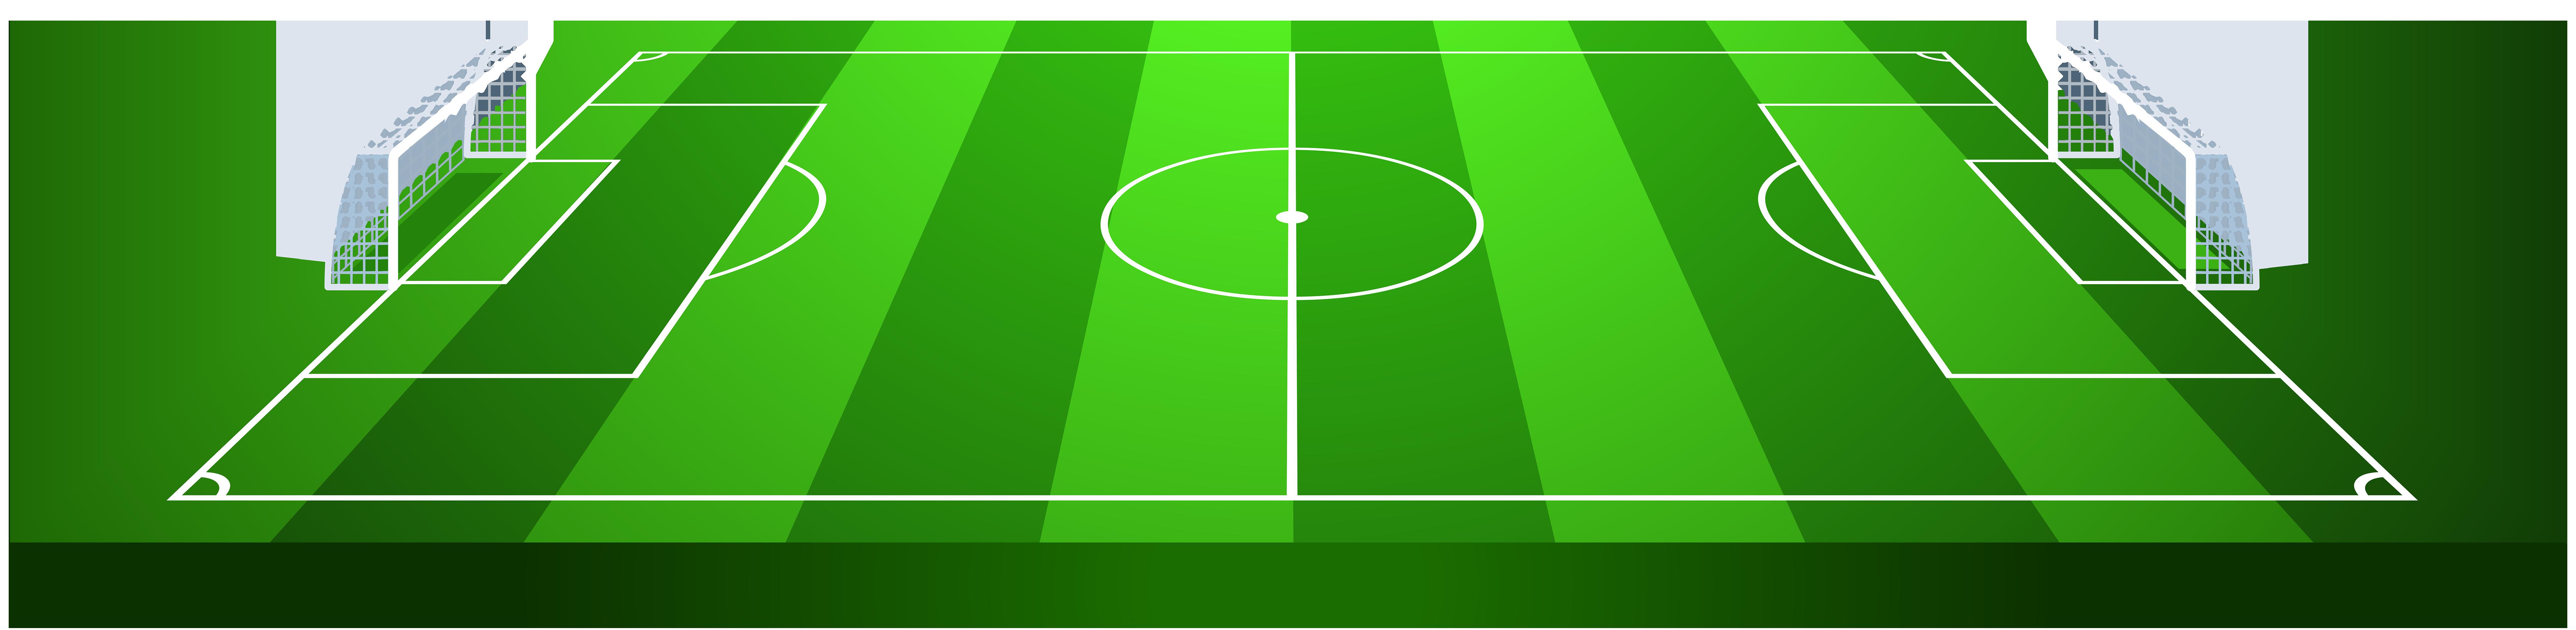 Soccer Field PNG Transparent Clip Art Image.